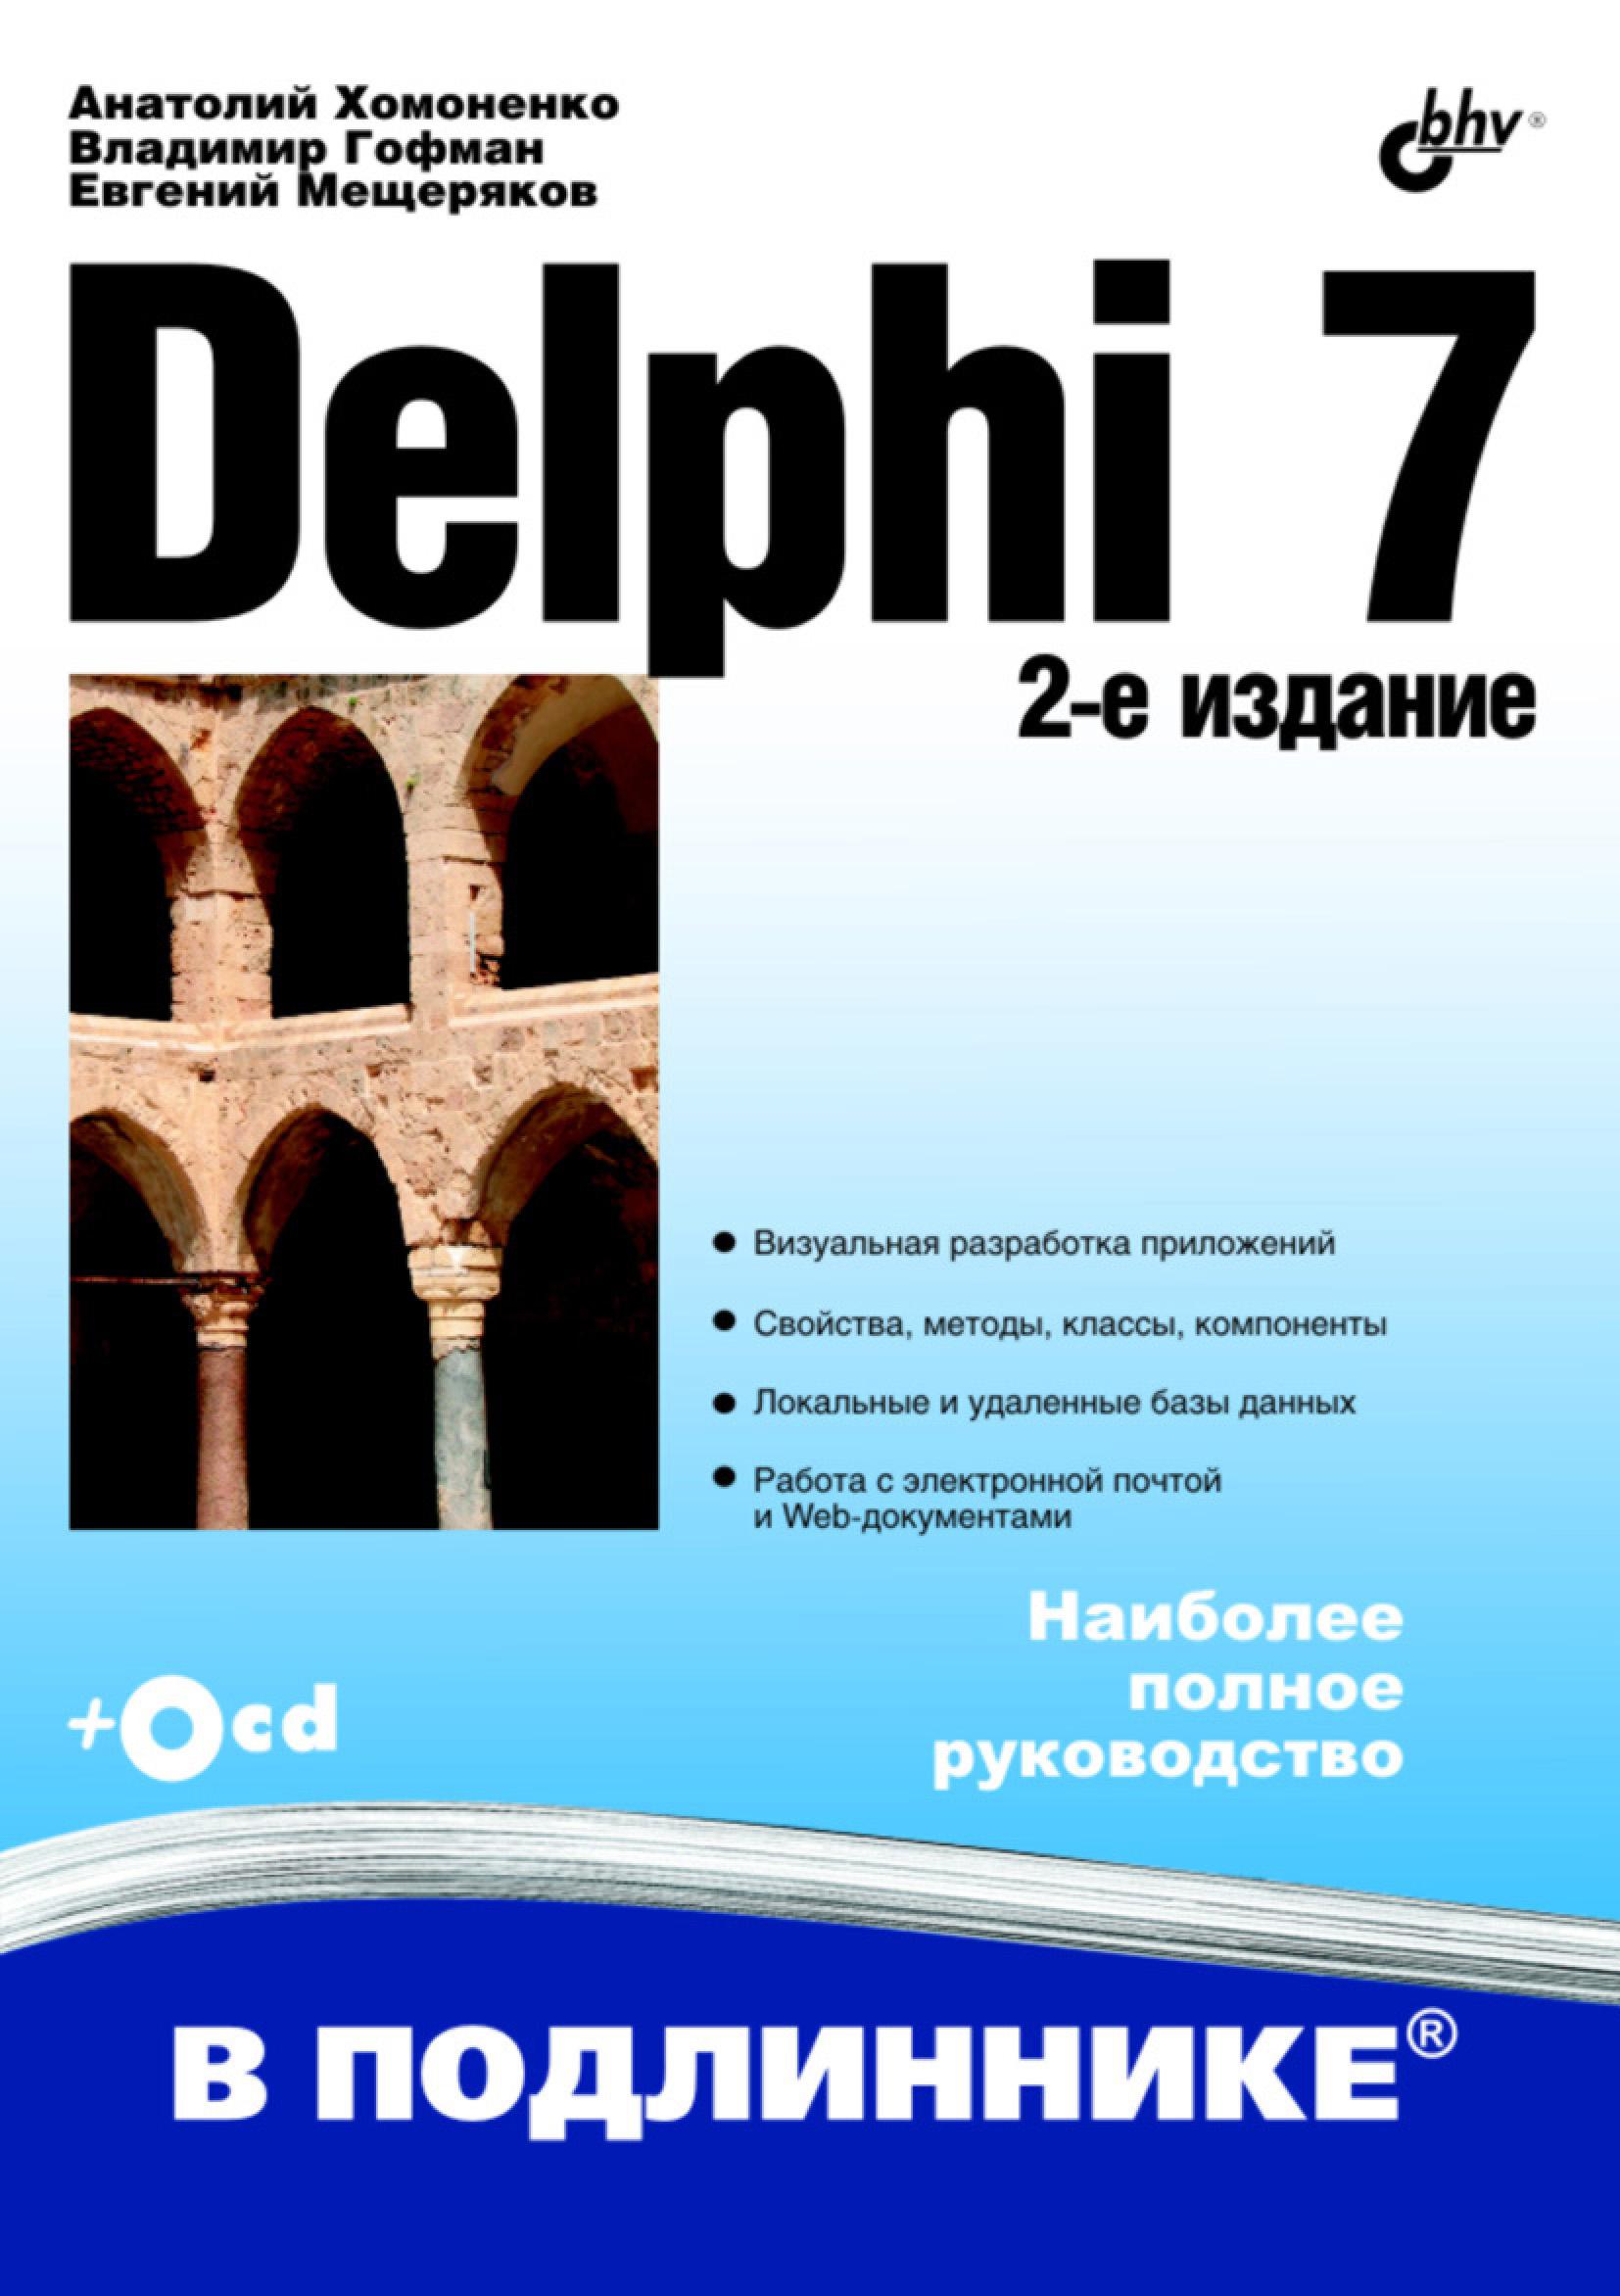 Анатолий Хомоненко, Владимир Гофман, Евгений Мещеряков «Delphi 7»